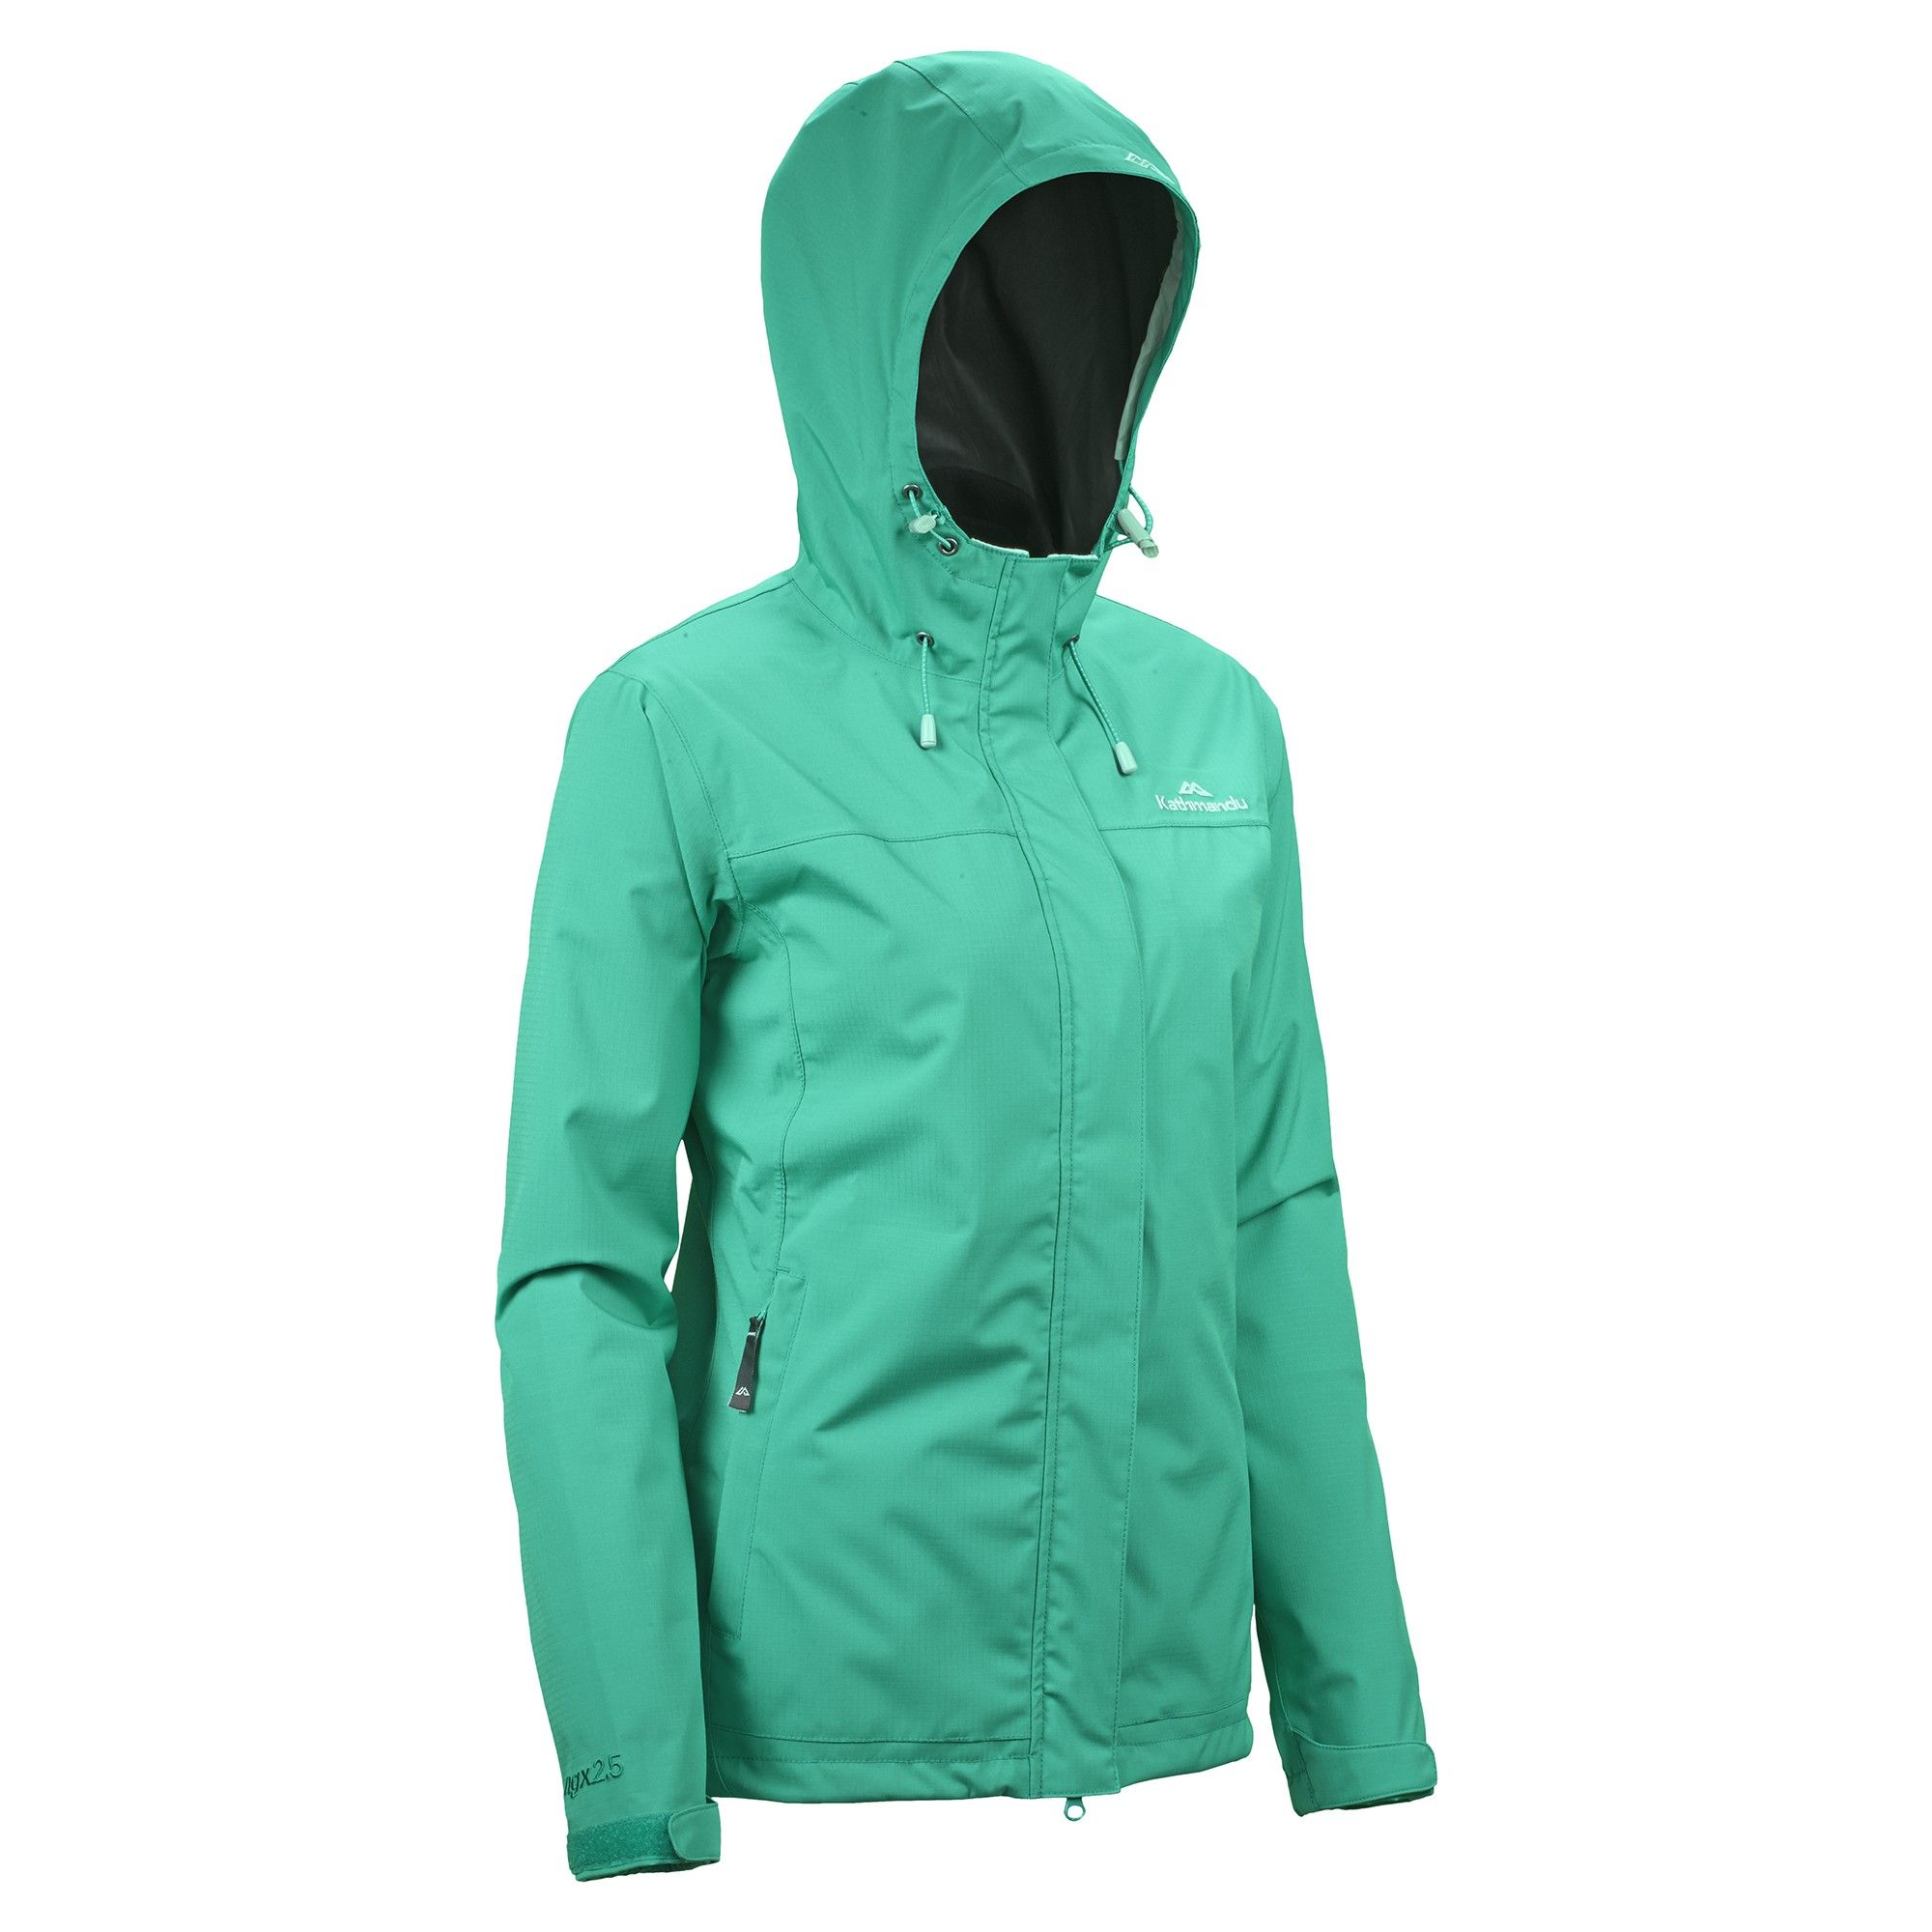 Buy Monrovia Women's 2.5 Layer Waterproof Jacket - Jade Green ...